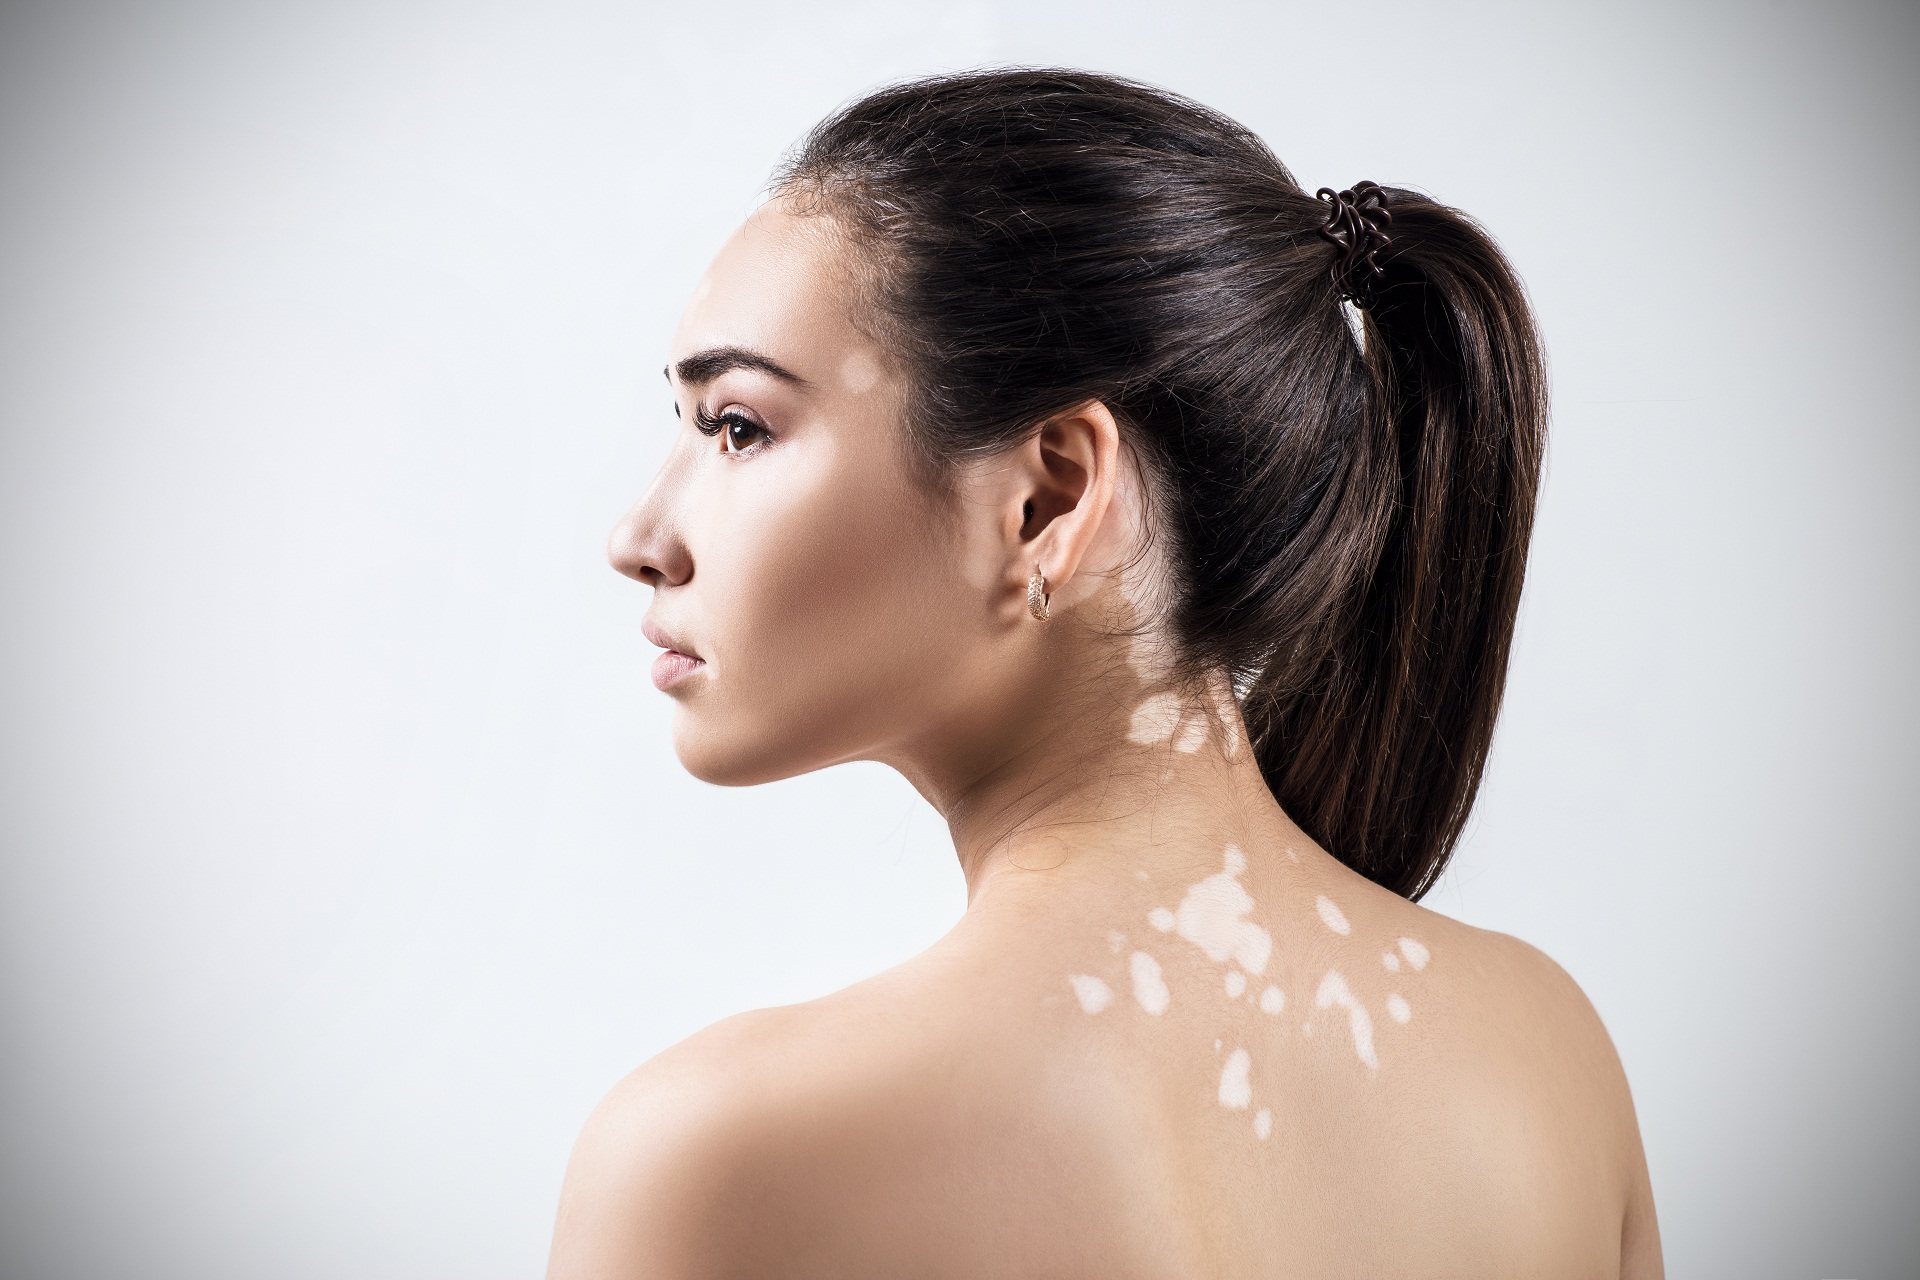 Manchas brancas pelo corpo: pode ser esclerose tuberosa